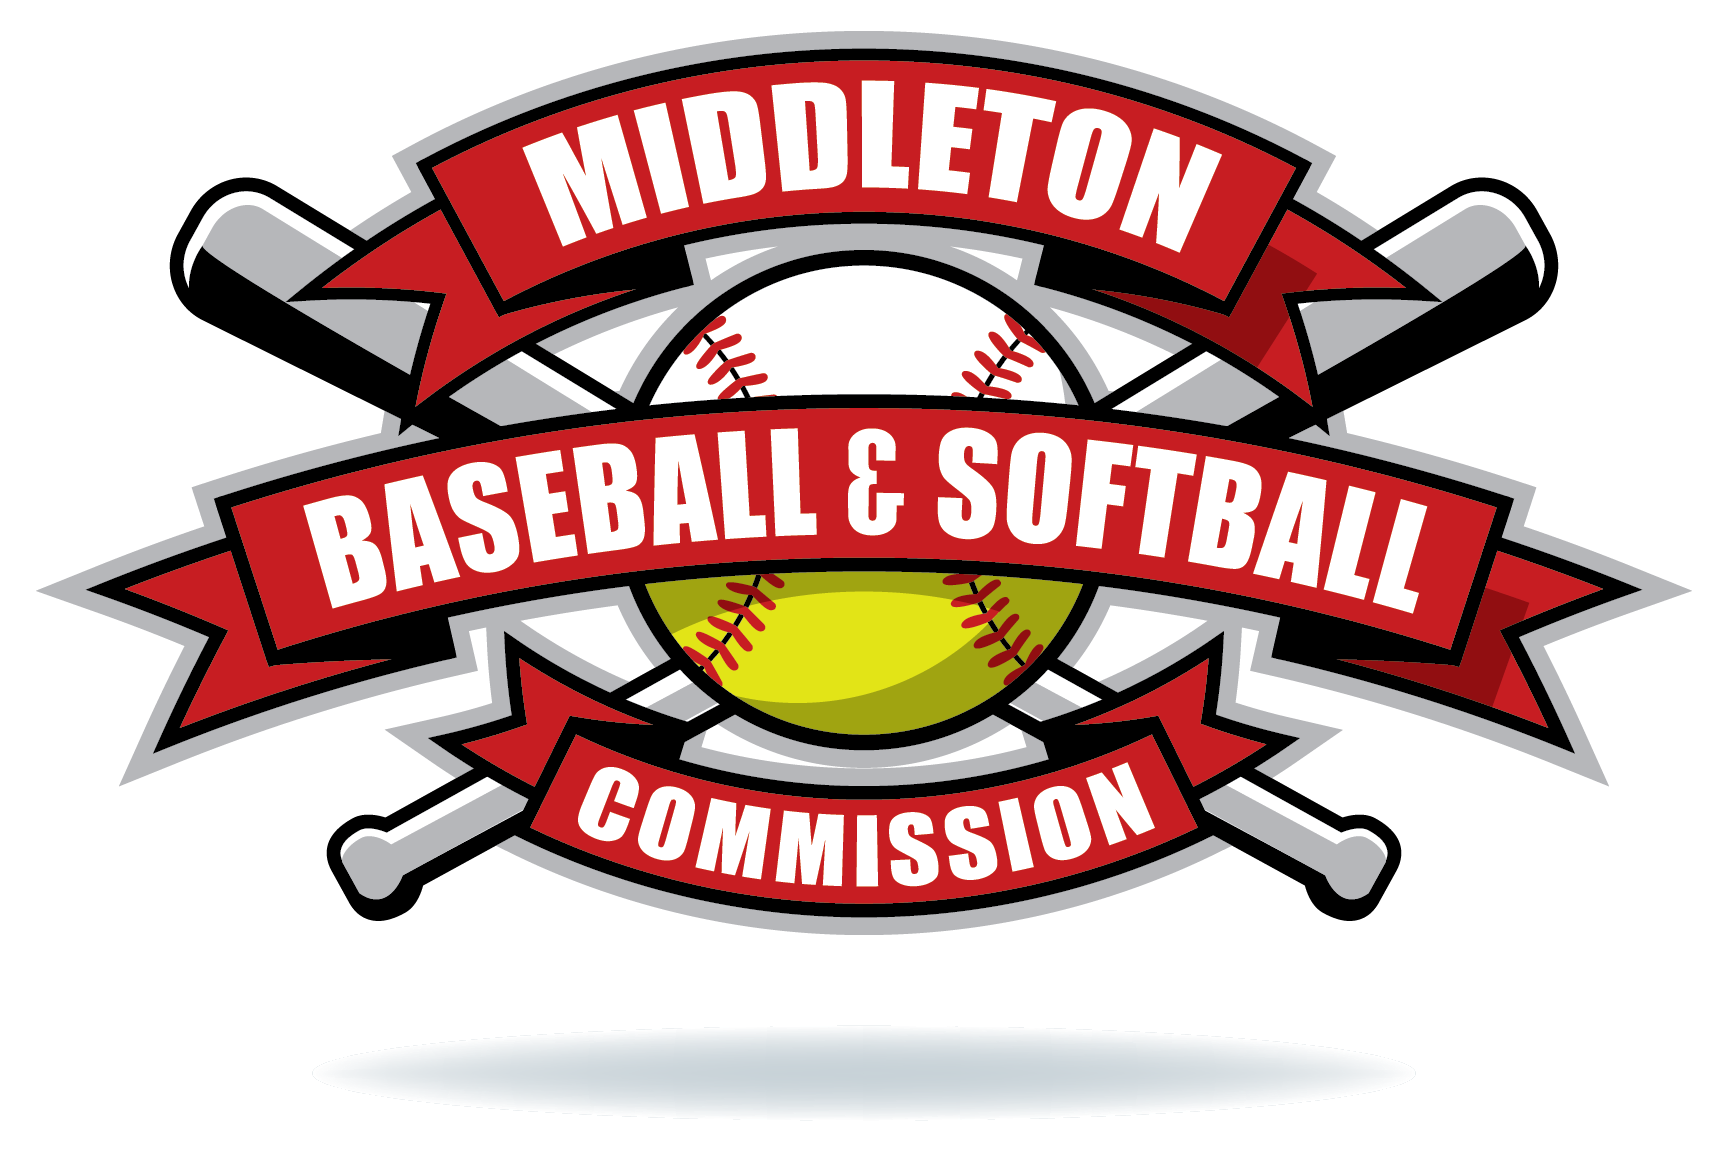 Middleton Baseball and Softball Commission